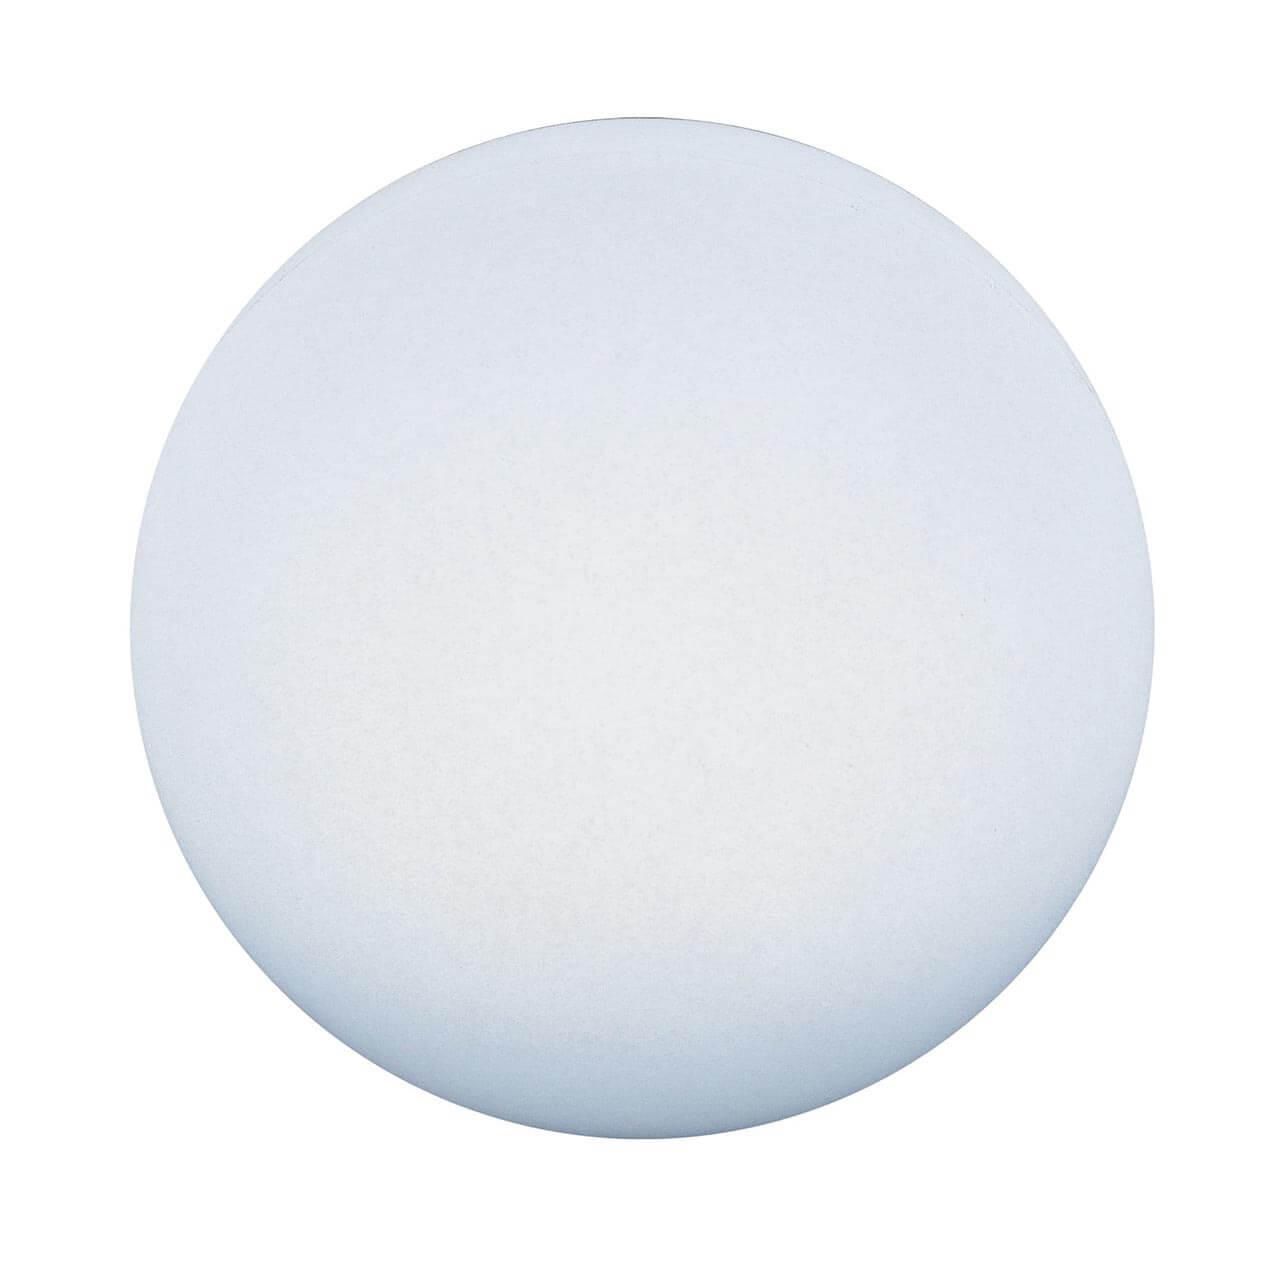 Светильник Uniel ULG-R001 020/RGB IP65 Ball ULV-R уличный светодиодный светильник ul 00003301 uniel ulg r001 020 rgb ip65 ball